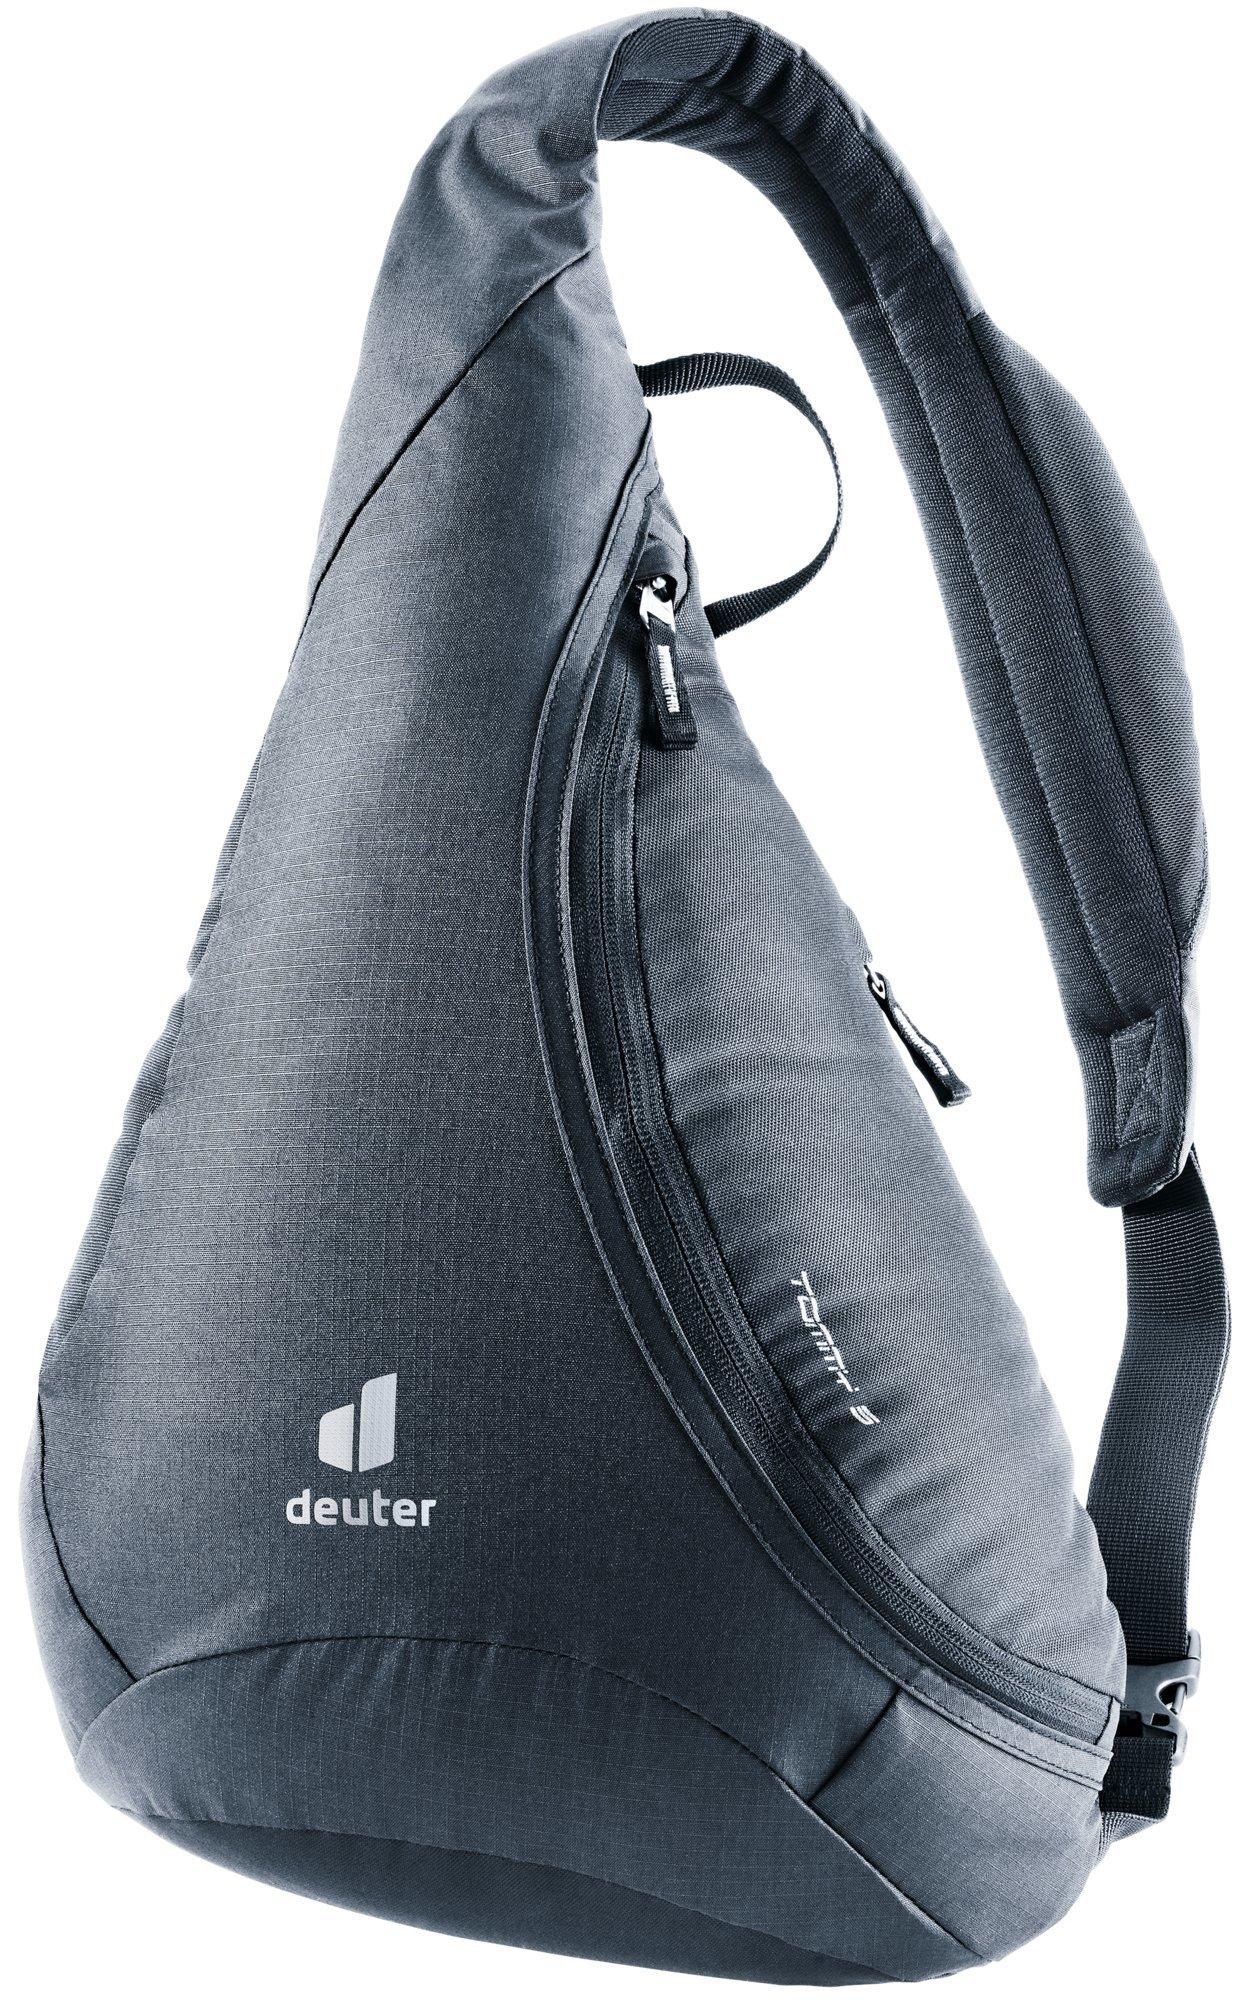 Однолямочные рюкзаки Рюкзак однолямочный Deuter Tommy S (2021) 3800021-7000-TommyS-s19-d0.jpg